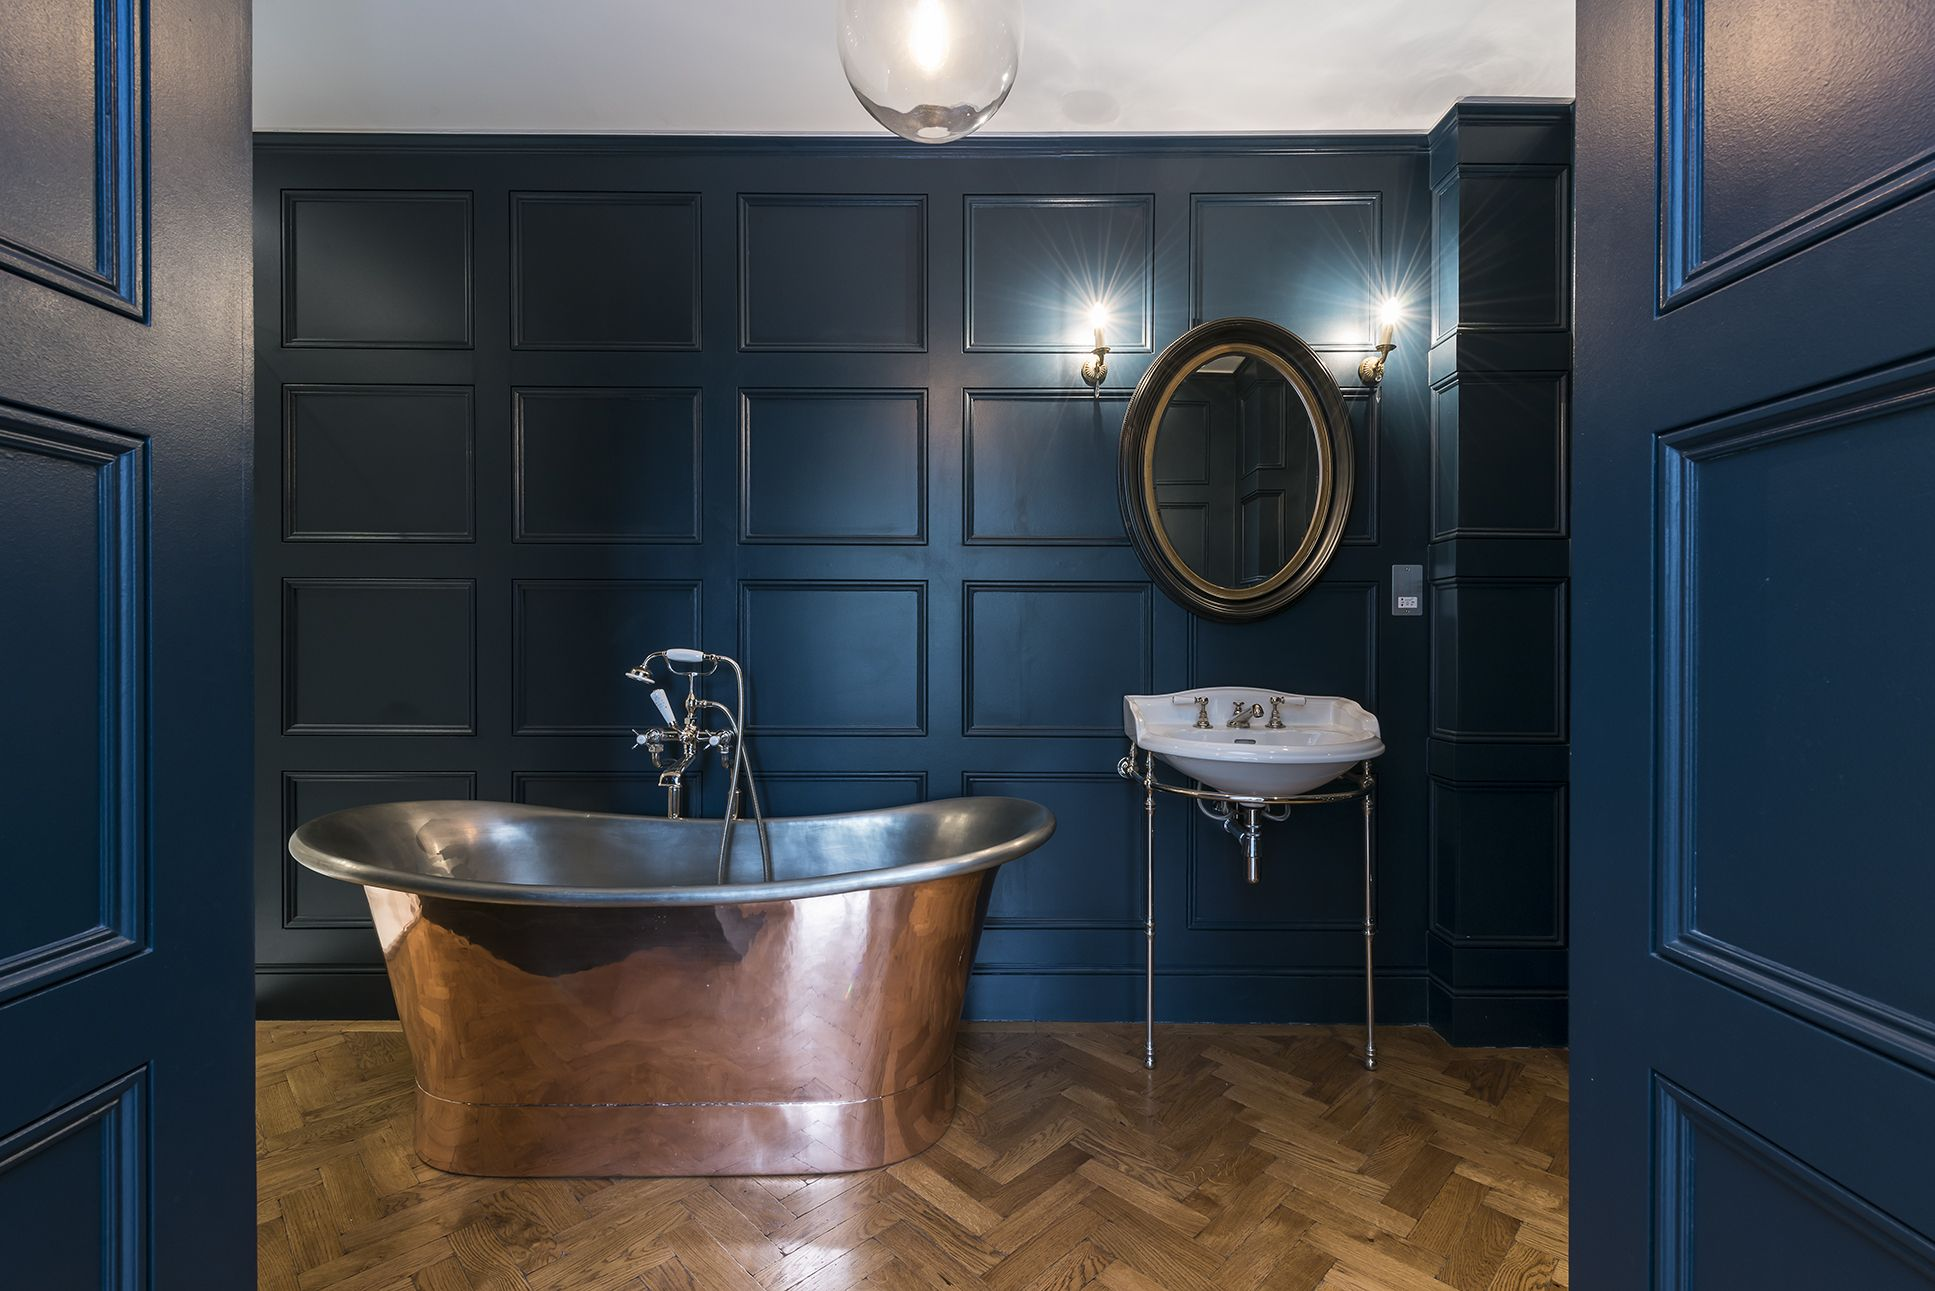 Pin By Coldwell Banker Homesale Realty With Stephanie Cerniglia On Bathroom 2 In 2020 Modern Bathroom Small Bathroom Renovations Amazing Bathrooms